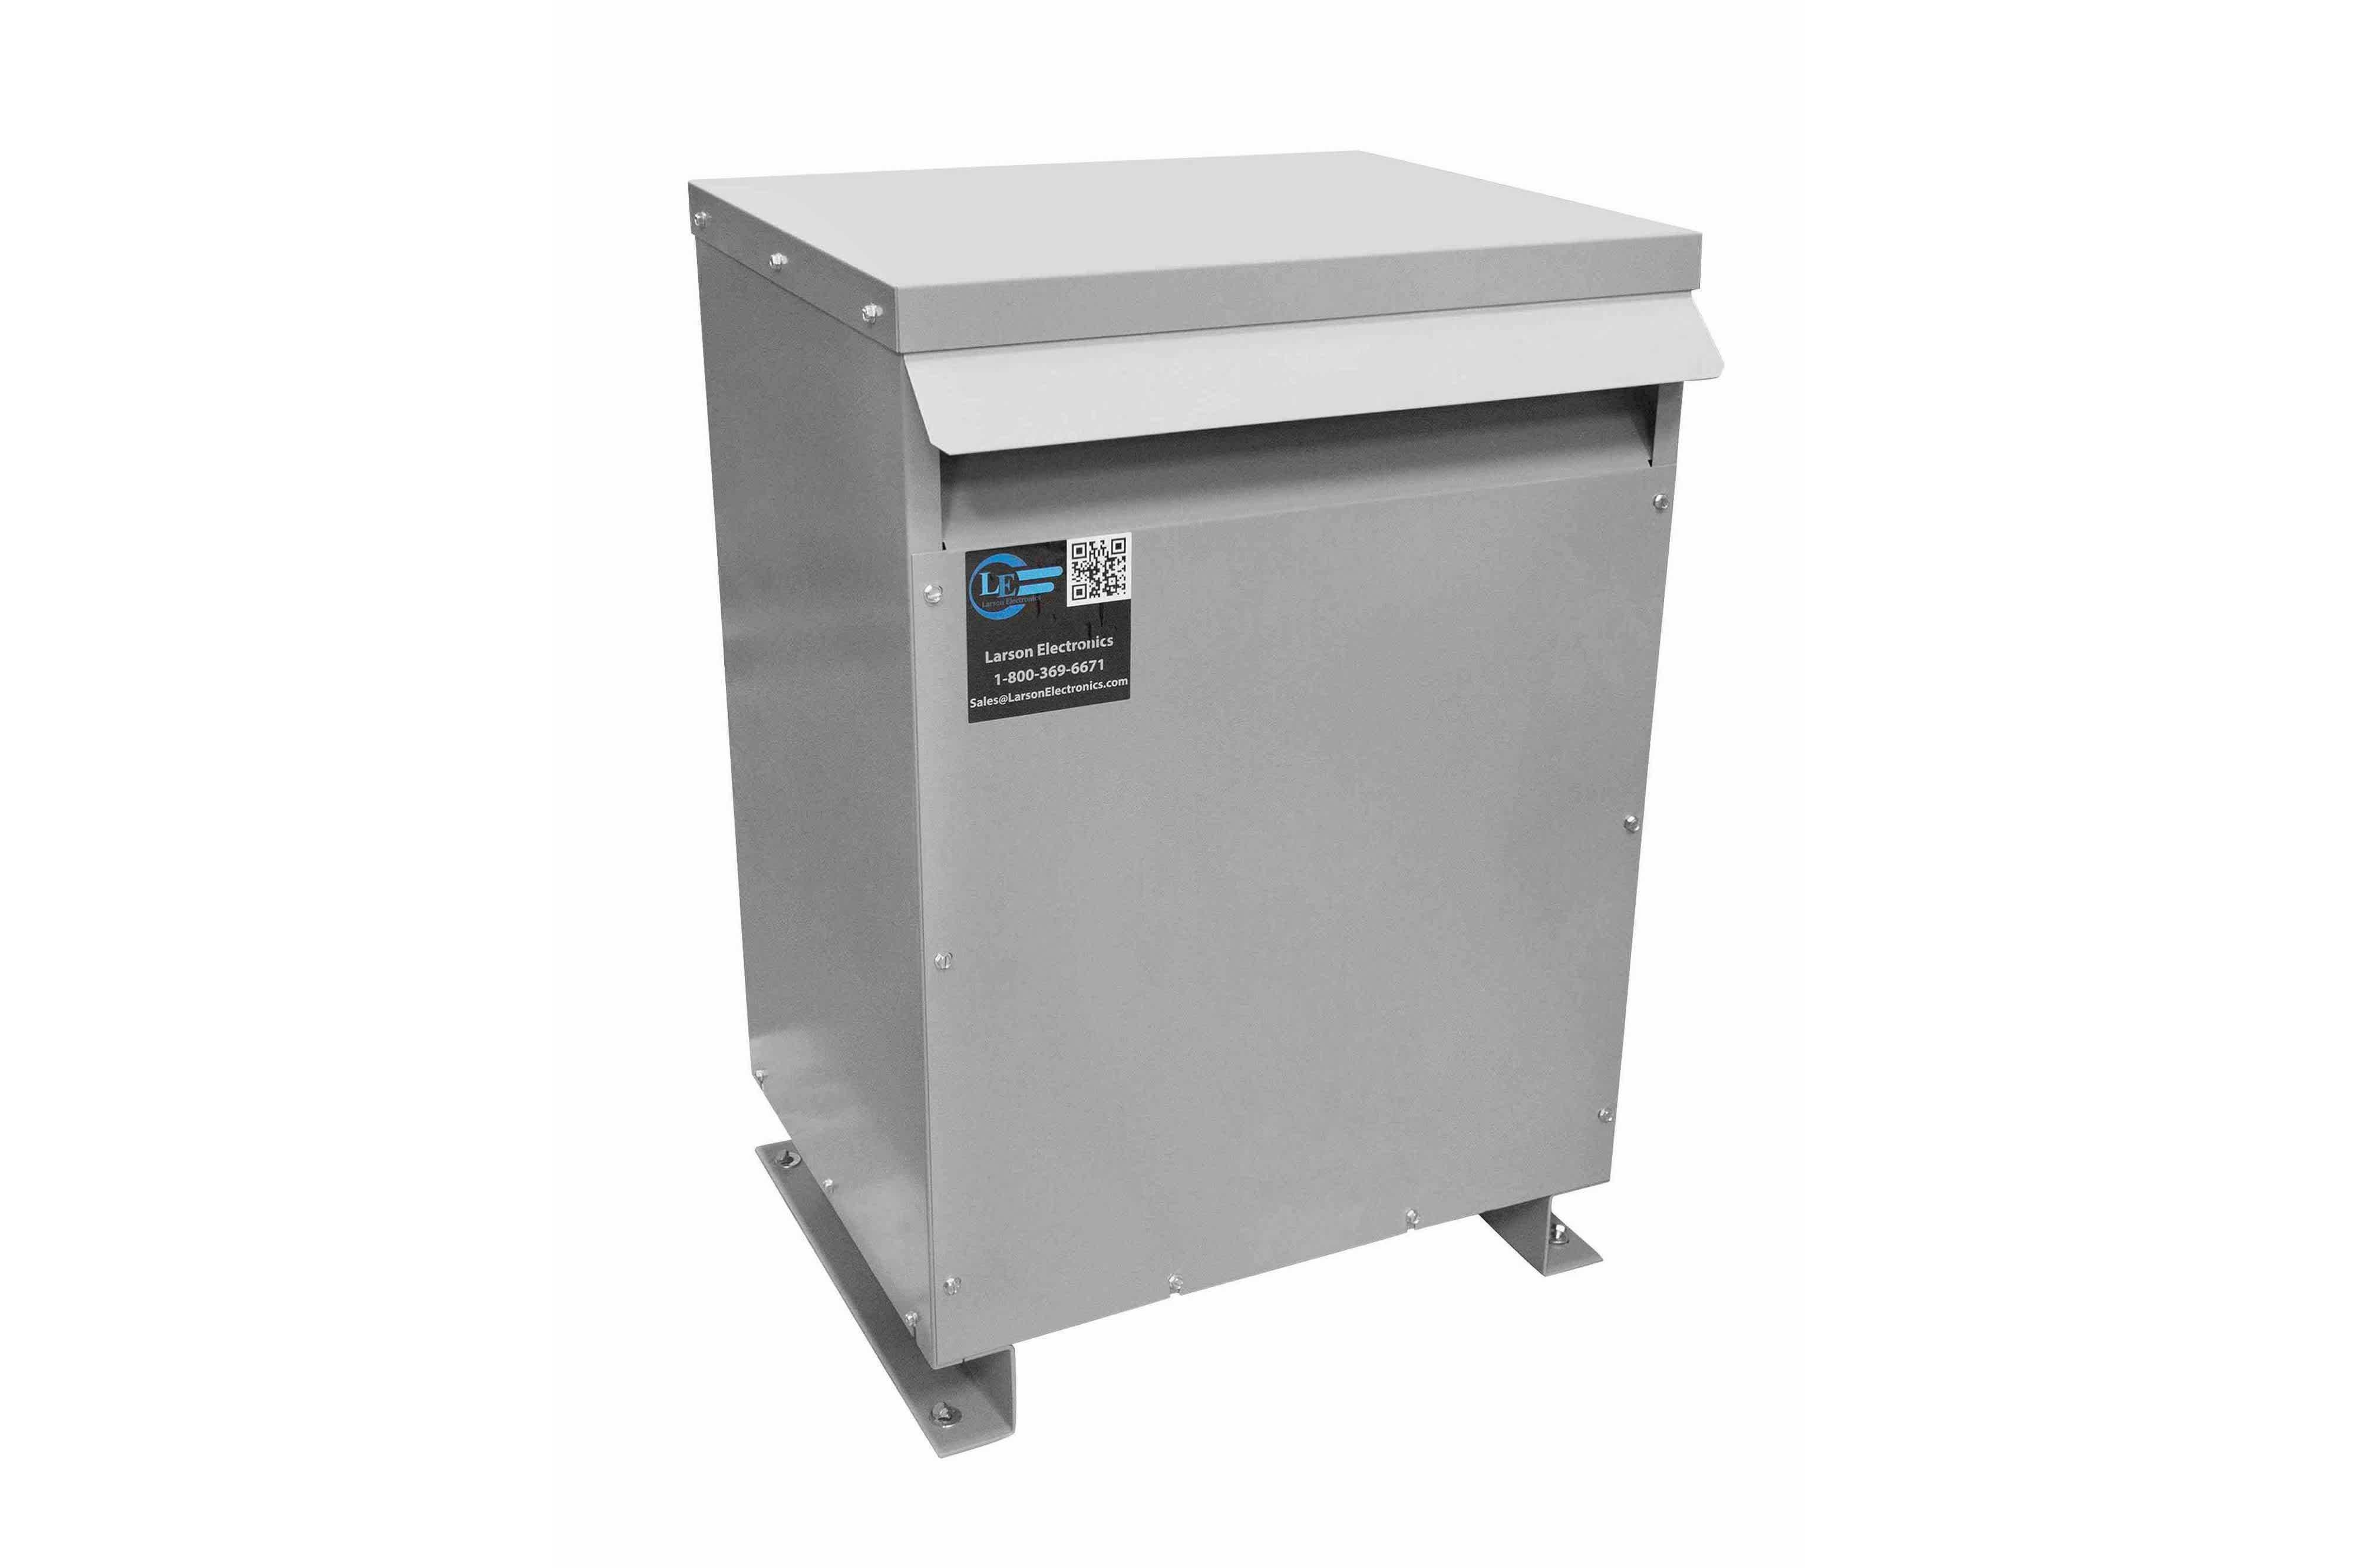 14 kVA 3PH Isolation Transformer, 400V Wye Primary, 240V/120 Delta Secondary, N3R, Ventilated, 60 Hz